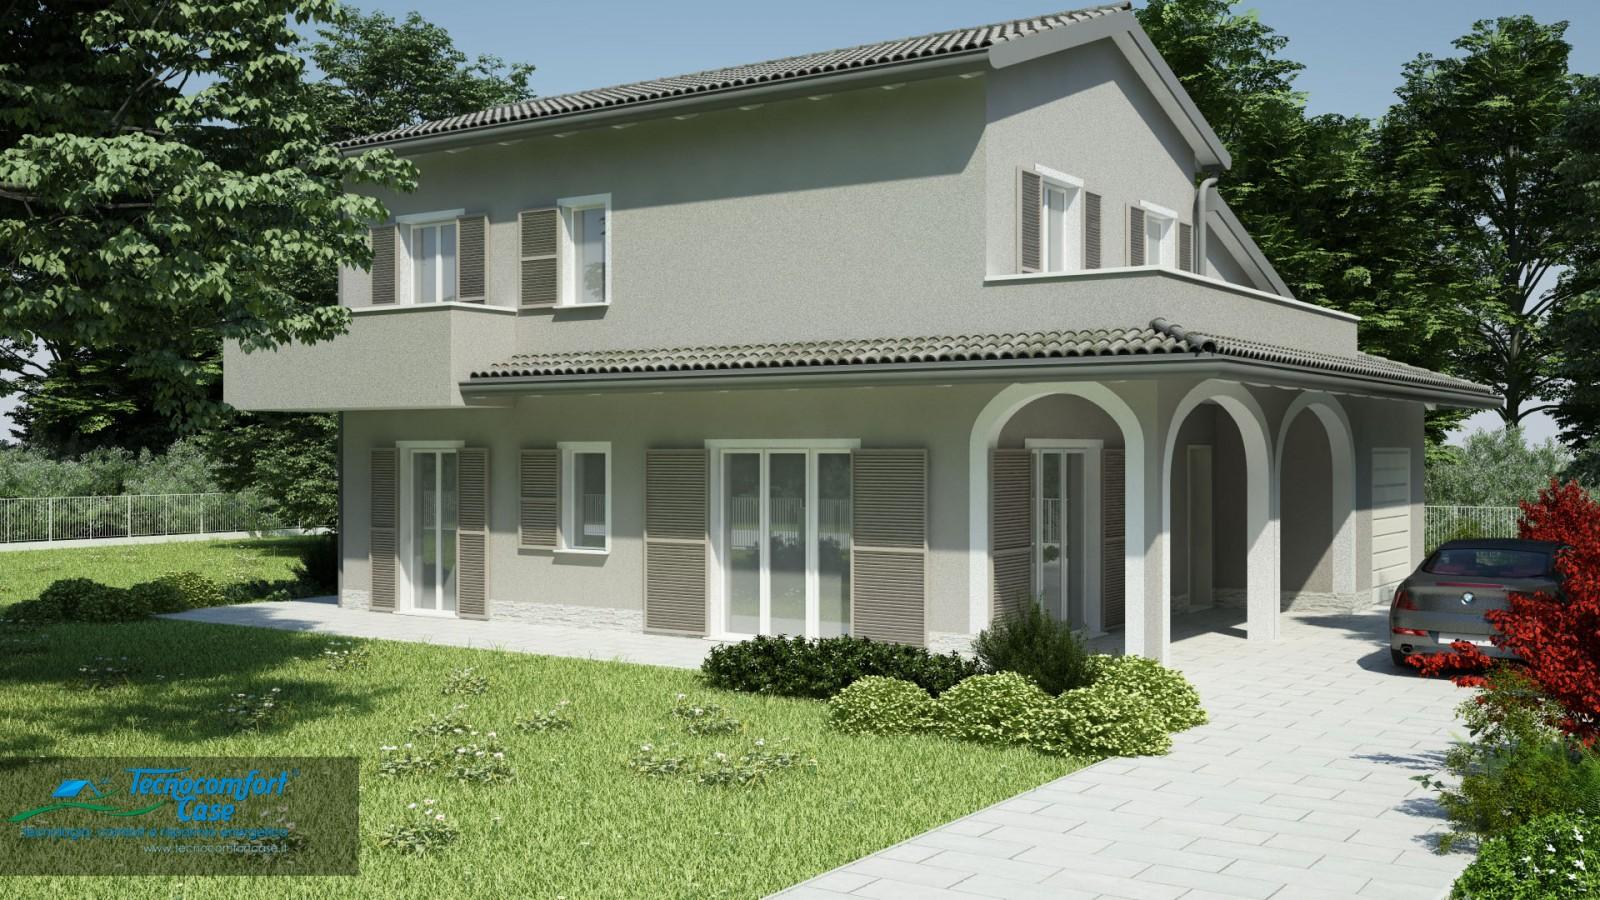 Case moderne prezzi il futuro gi di casa with case - Foto di case moderne ...